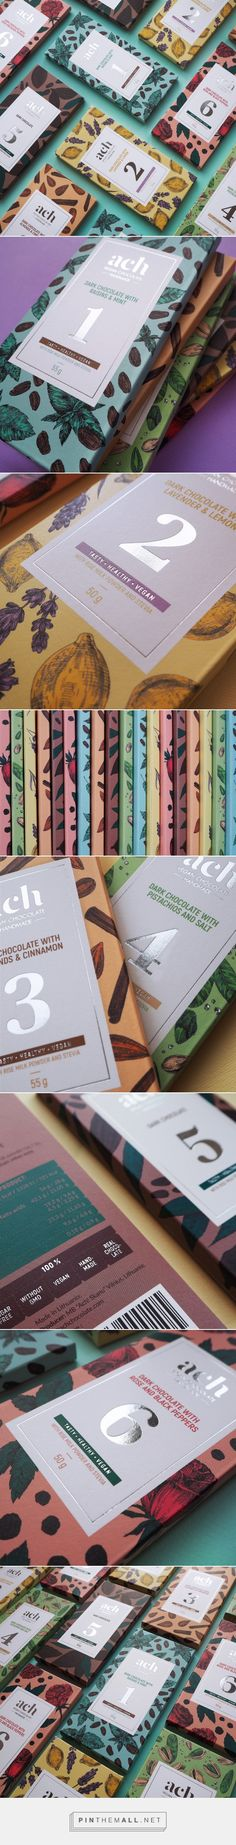 ACH Vegan Chocolate packaging design by Gintarė Marcinkevičienė - http://www.packagingoftheworld.com/2017/10/ach-vegan-chocolate.html